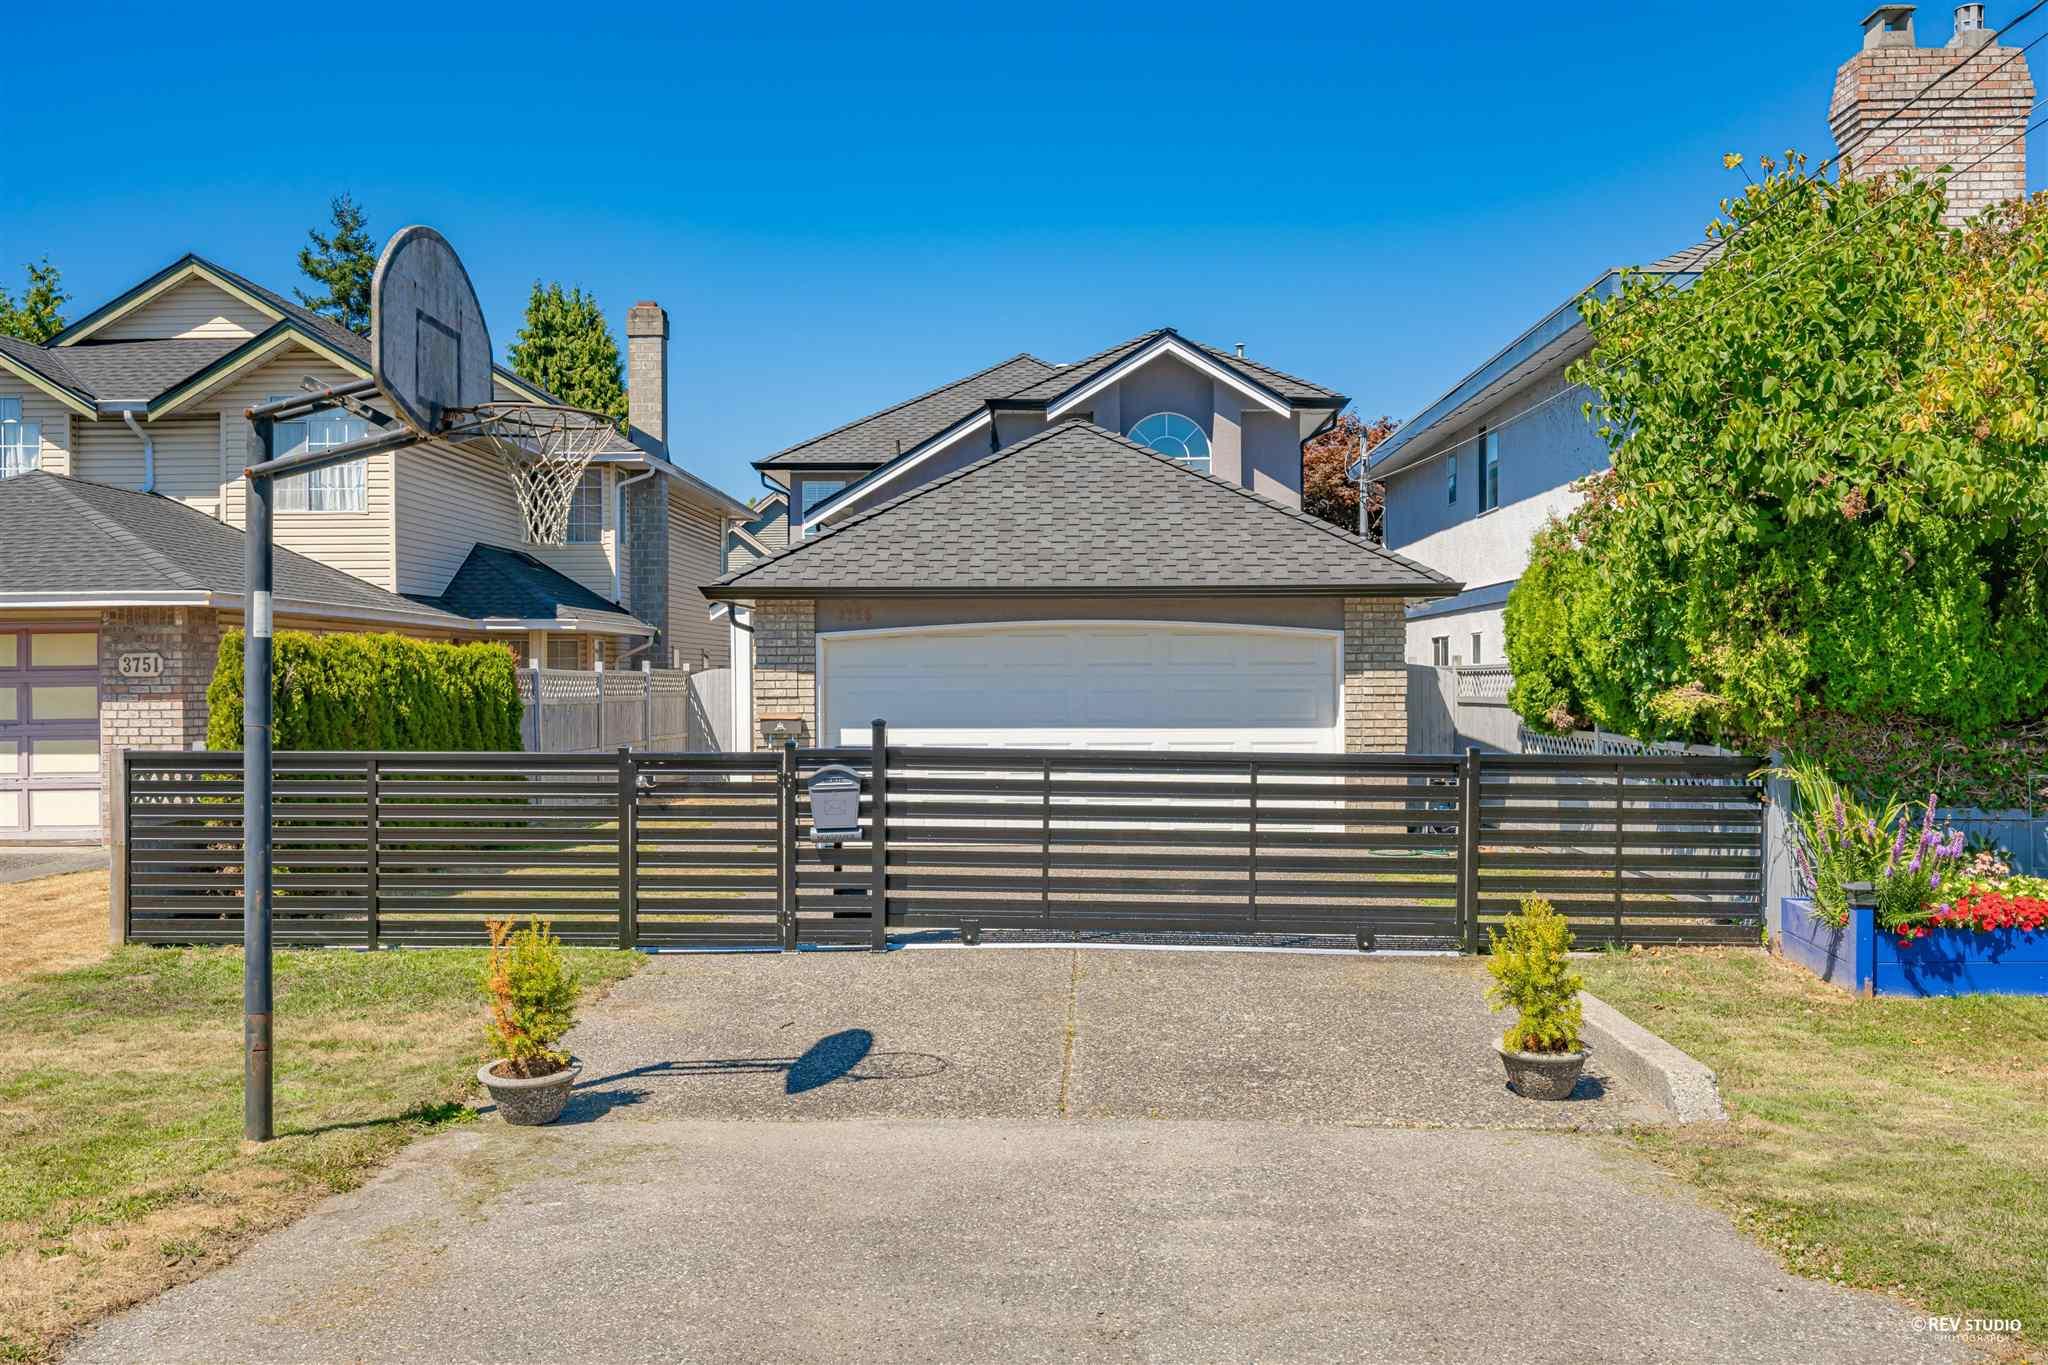 3755 RICHMOND STREET - Steveston Village House/Single Family for sale, 4 Bedrooms (R2605926)